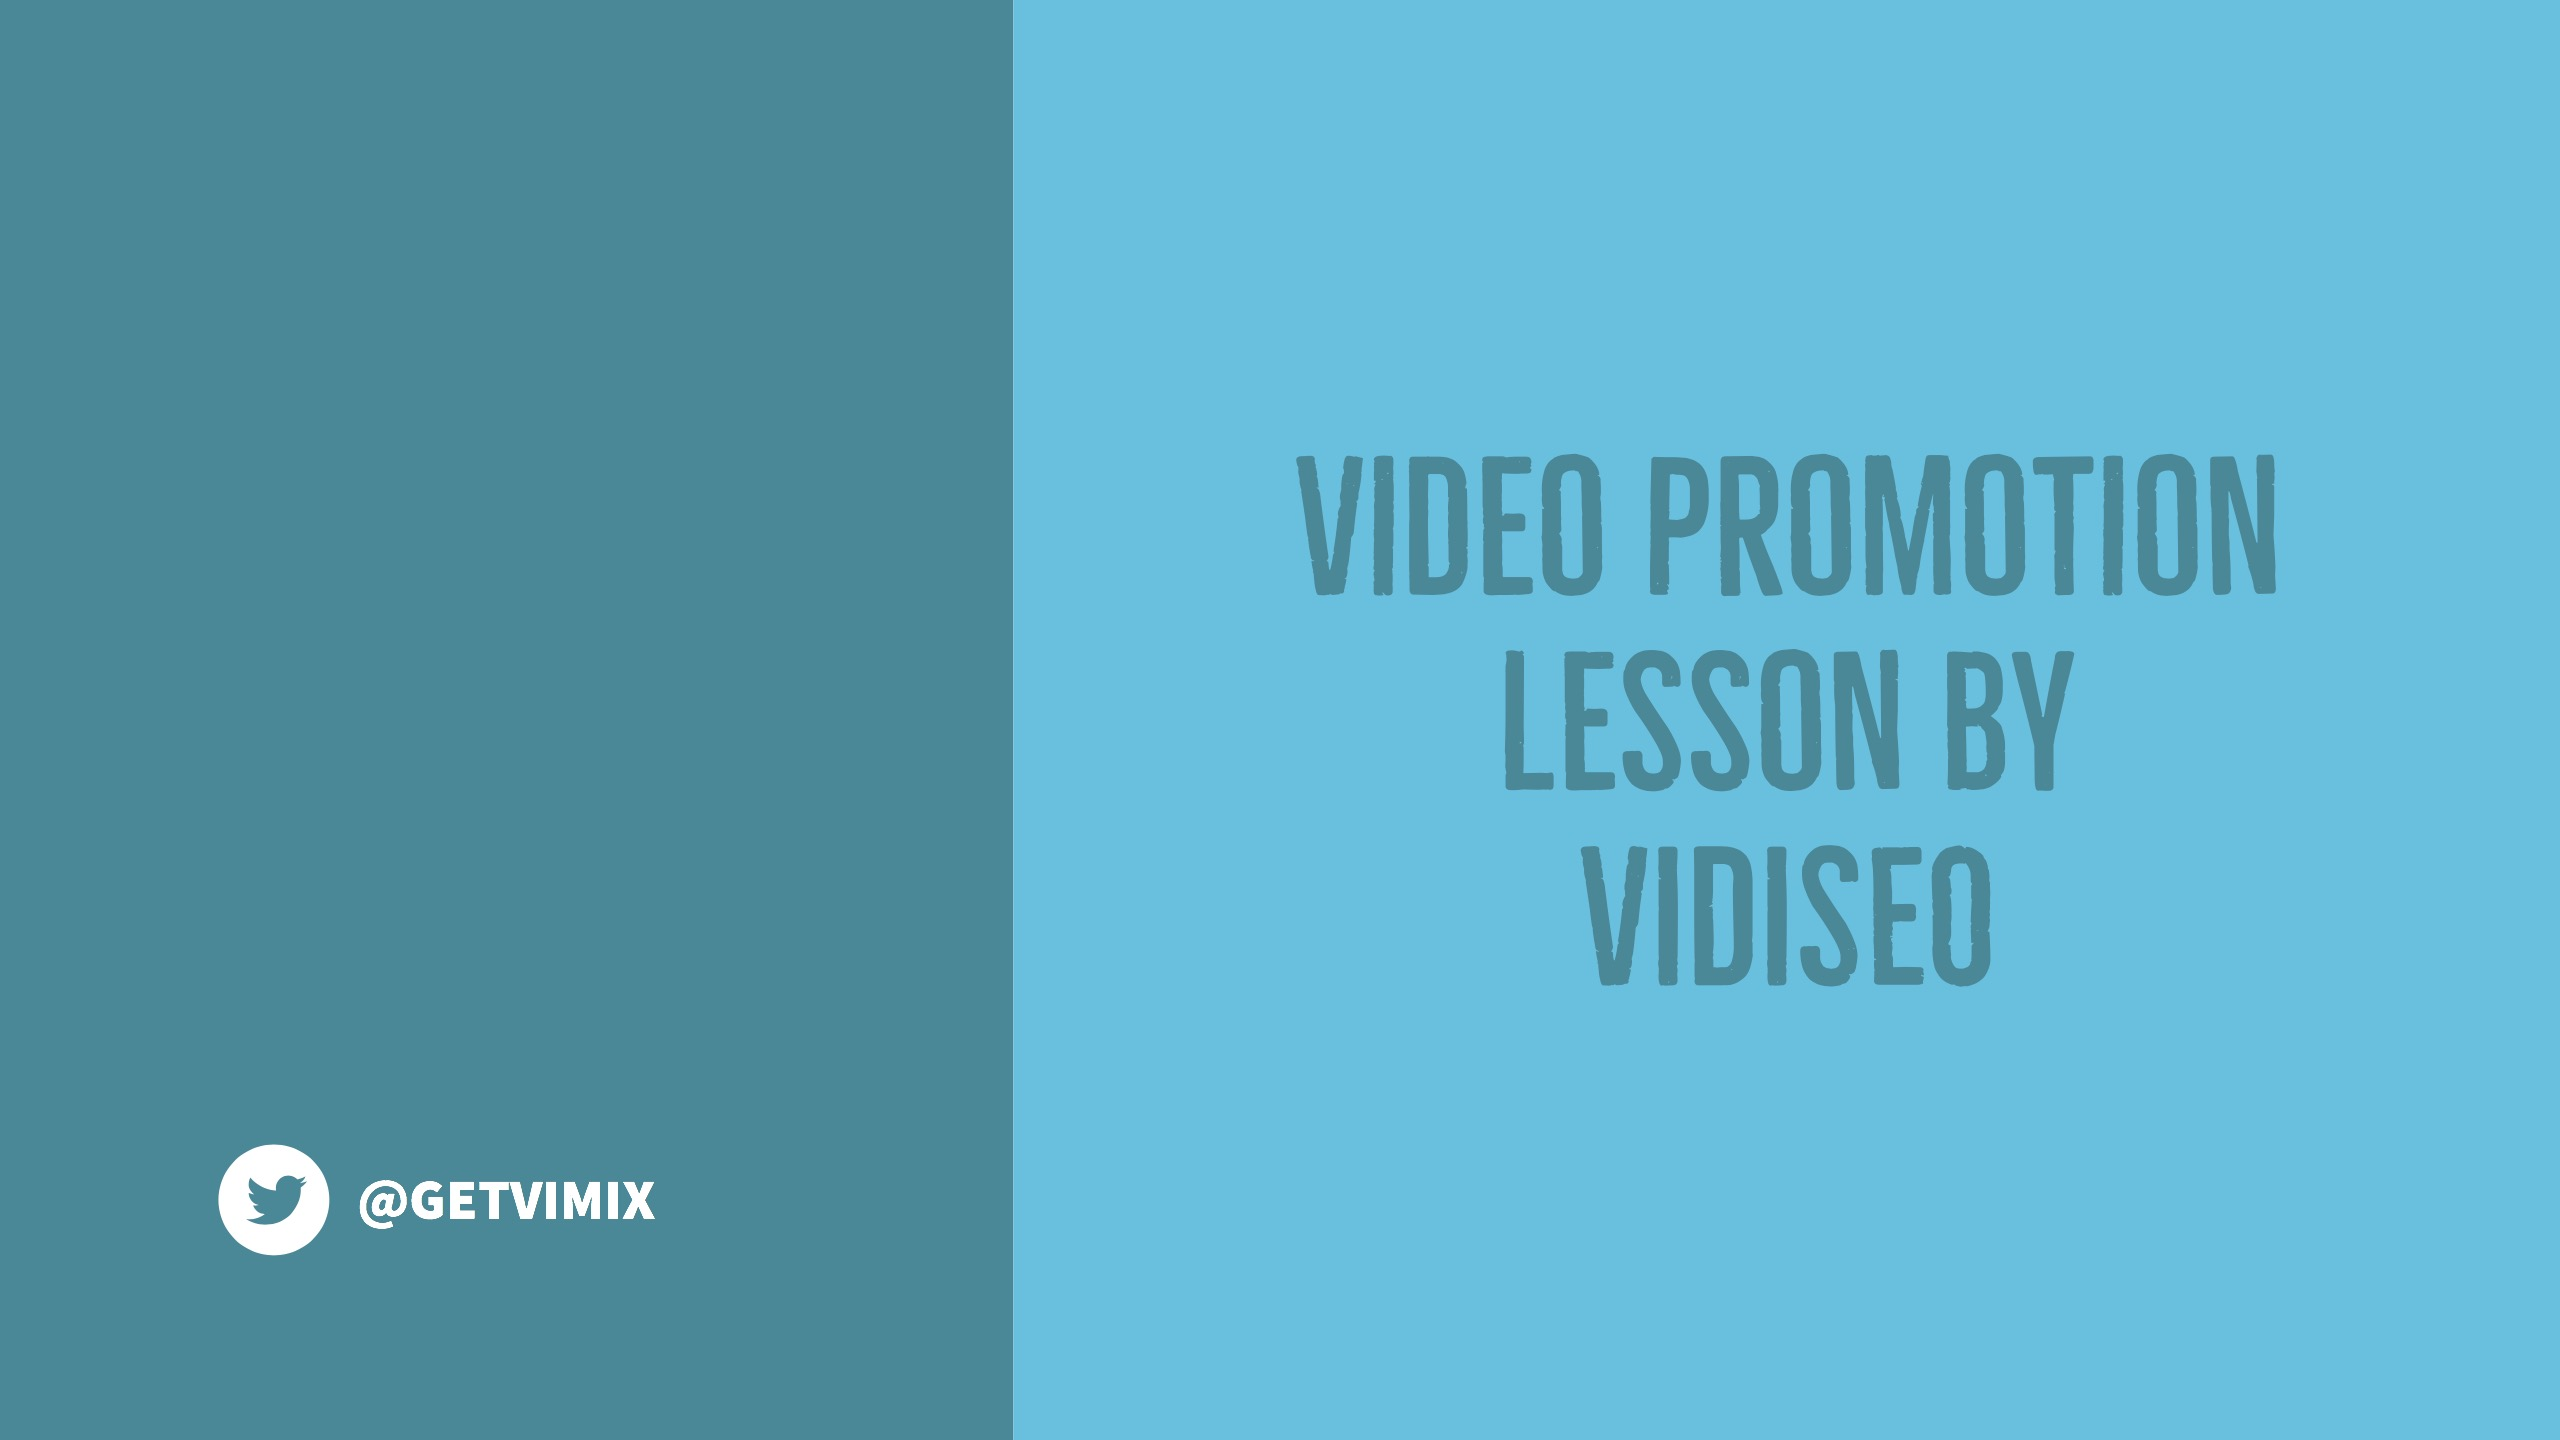 Video Promotion Lesson